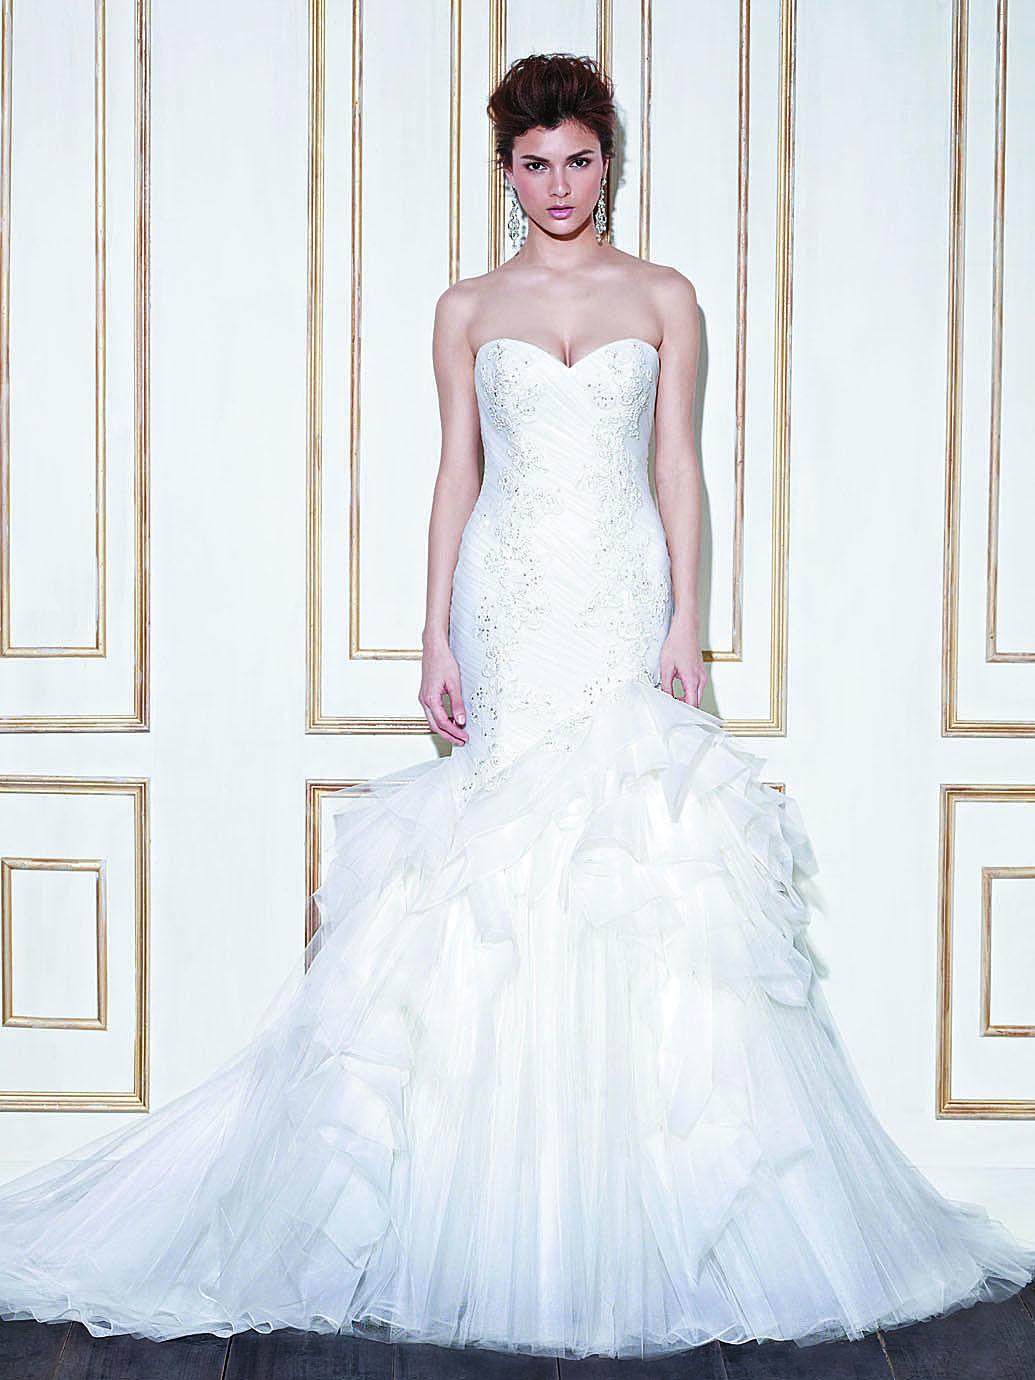 Style number 19722 designer dresses 4 pinterest wedding buy wedding dresses enzoani guam blue by enzoani 2014 at cheap price ombrellifo Choice Image